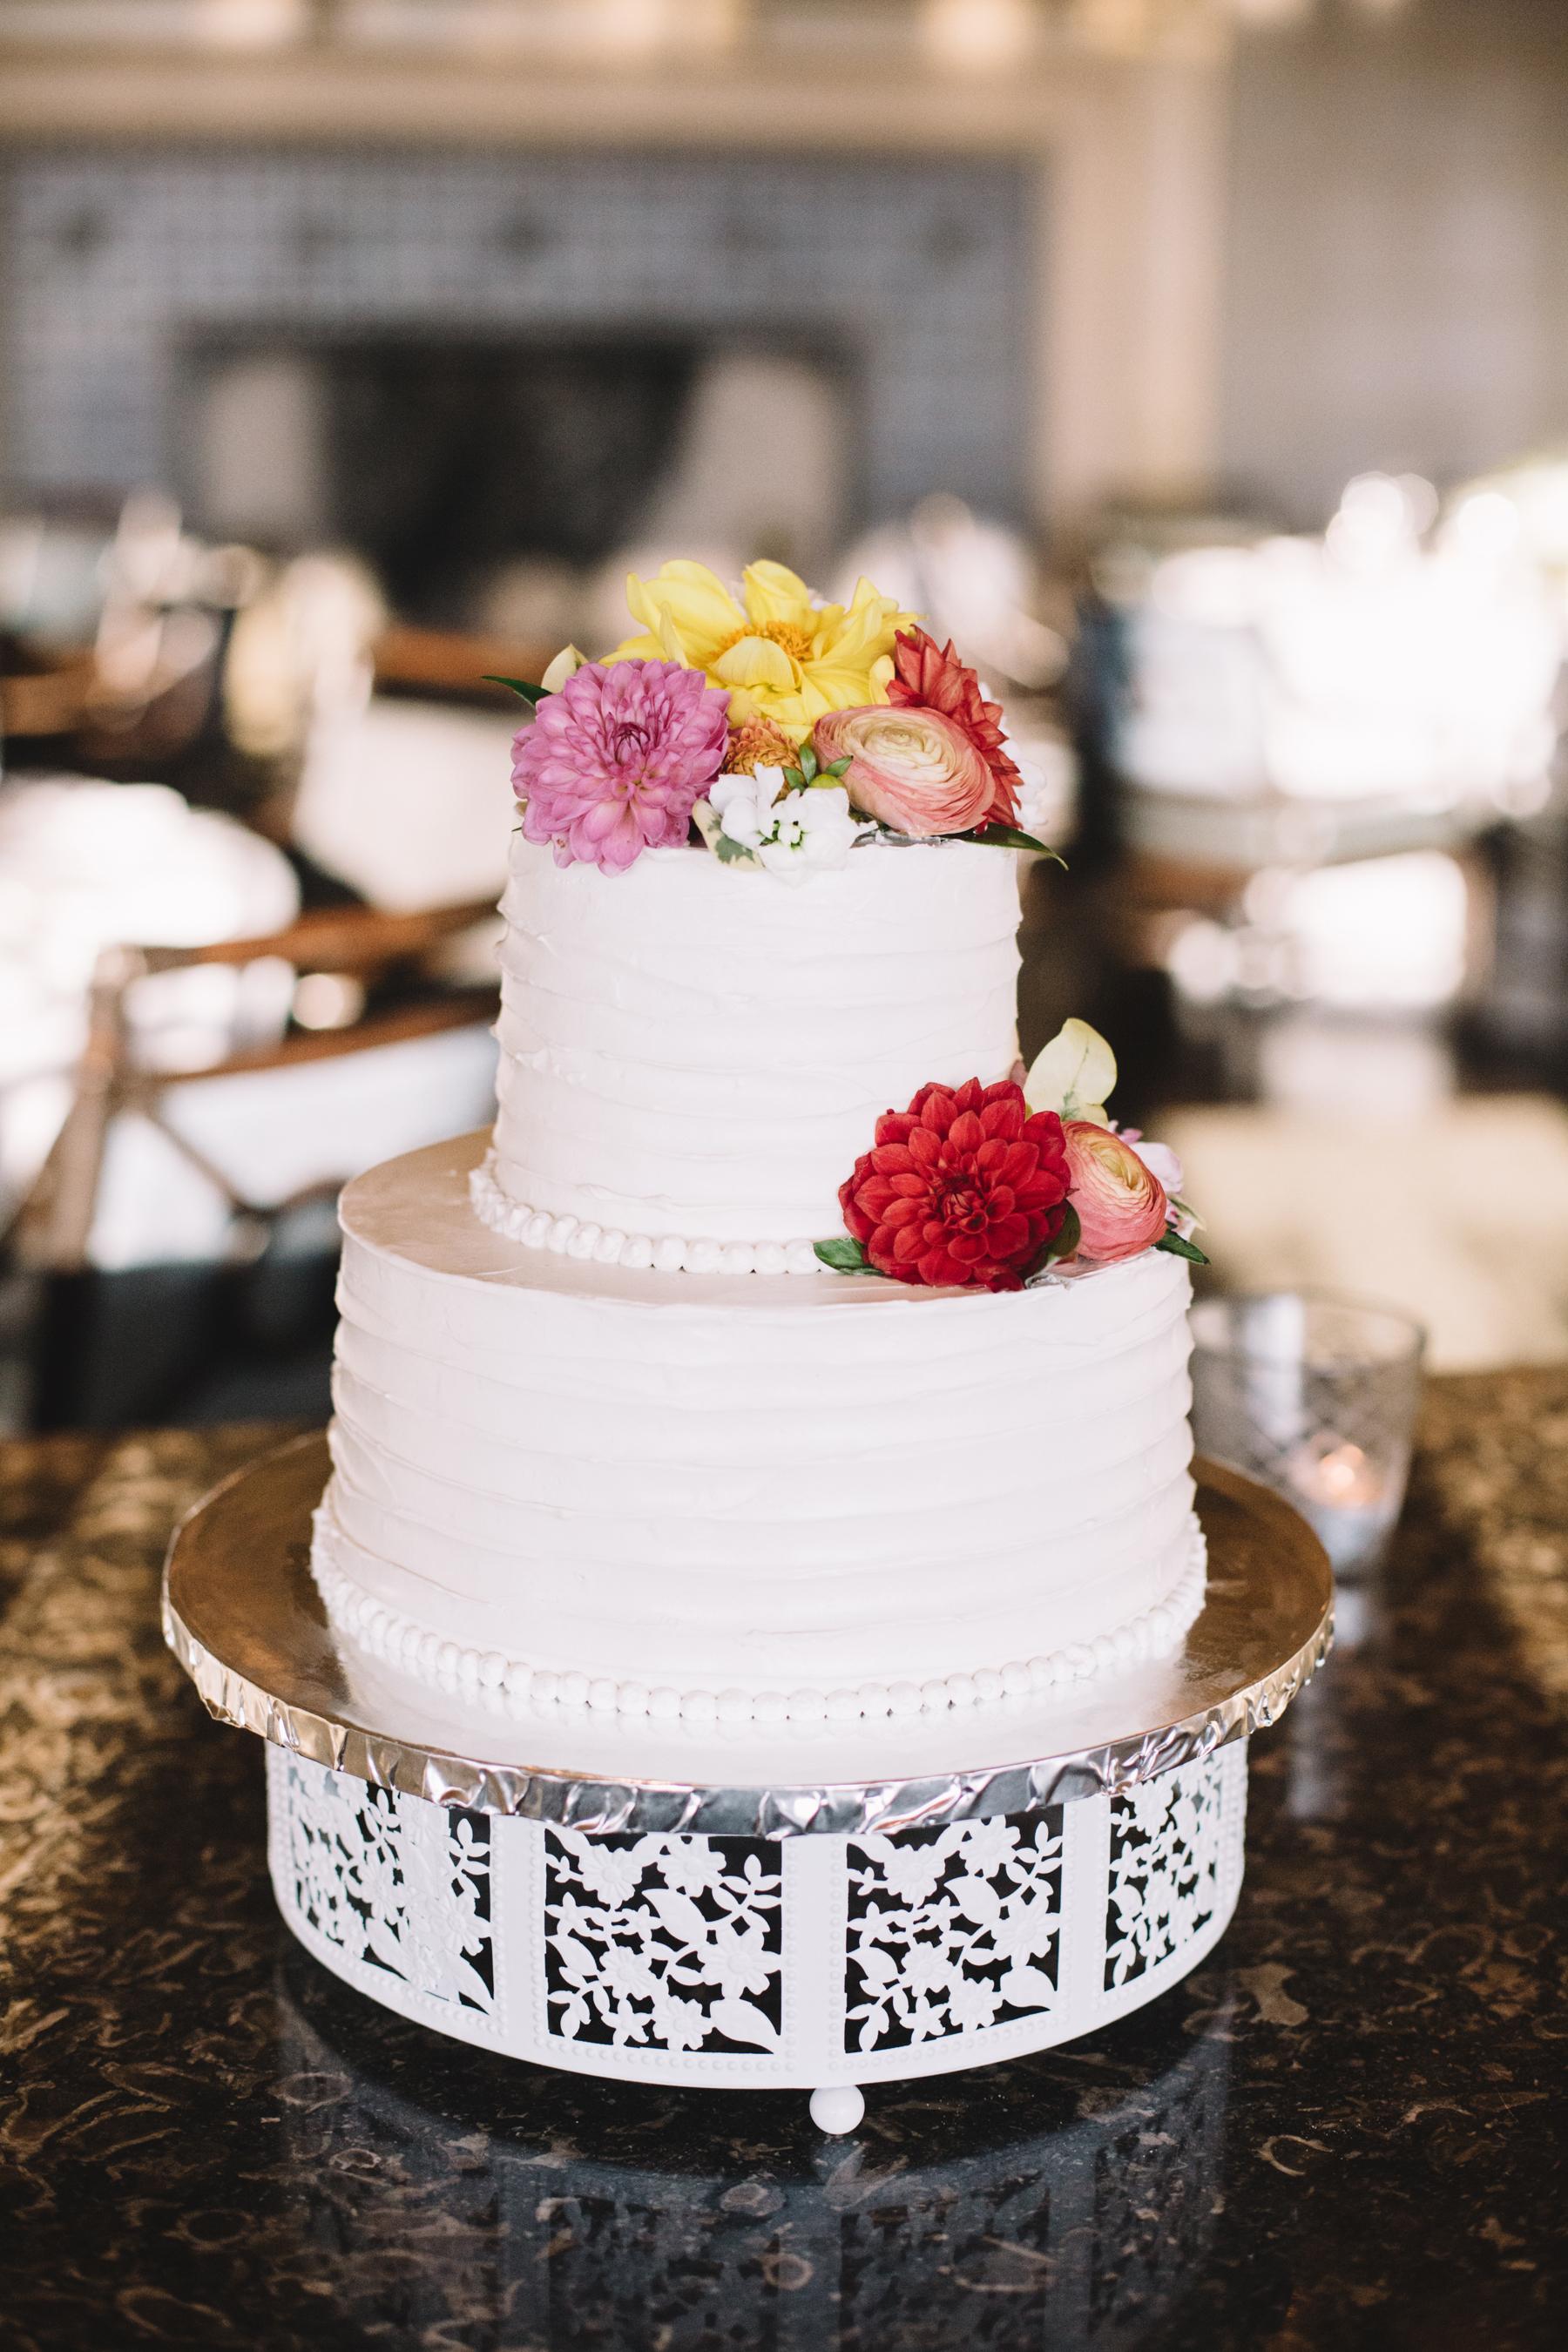 Two Tier Simple Wedding Cake Elizabeth Anne Designs The Wedding Blog